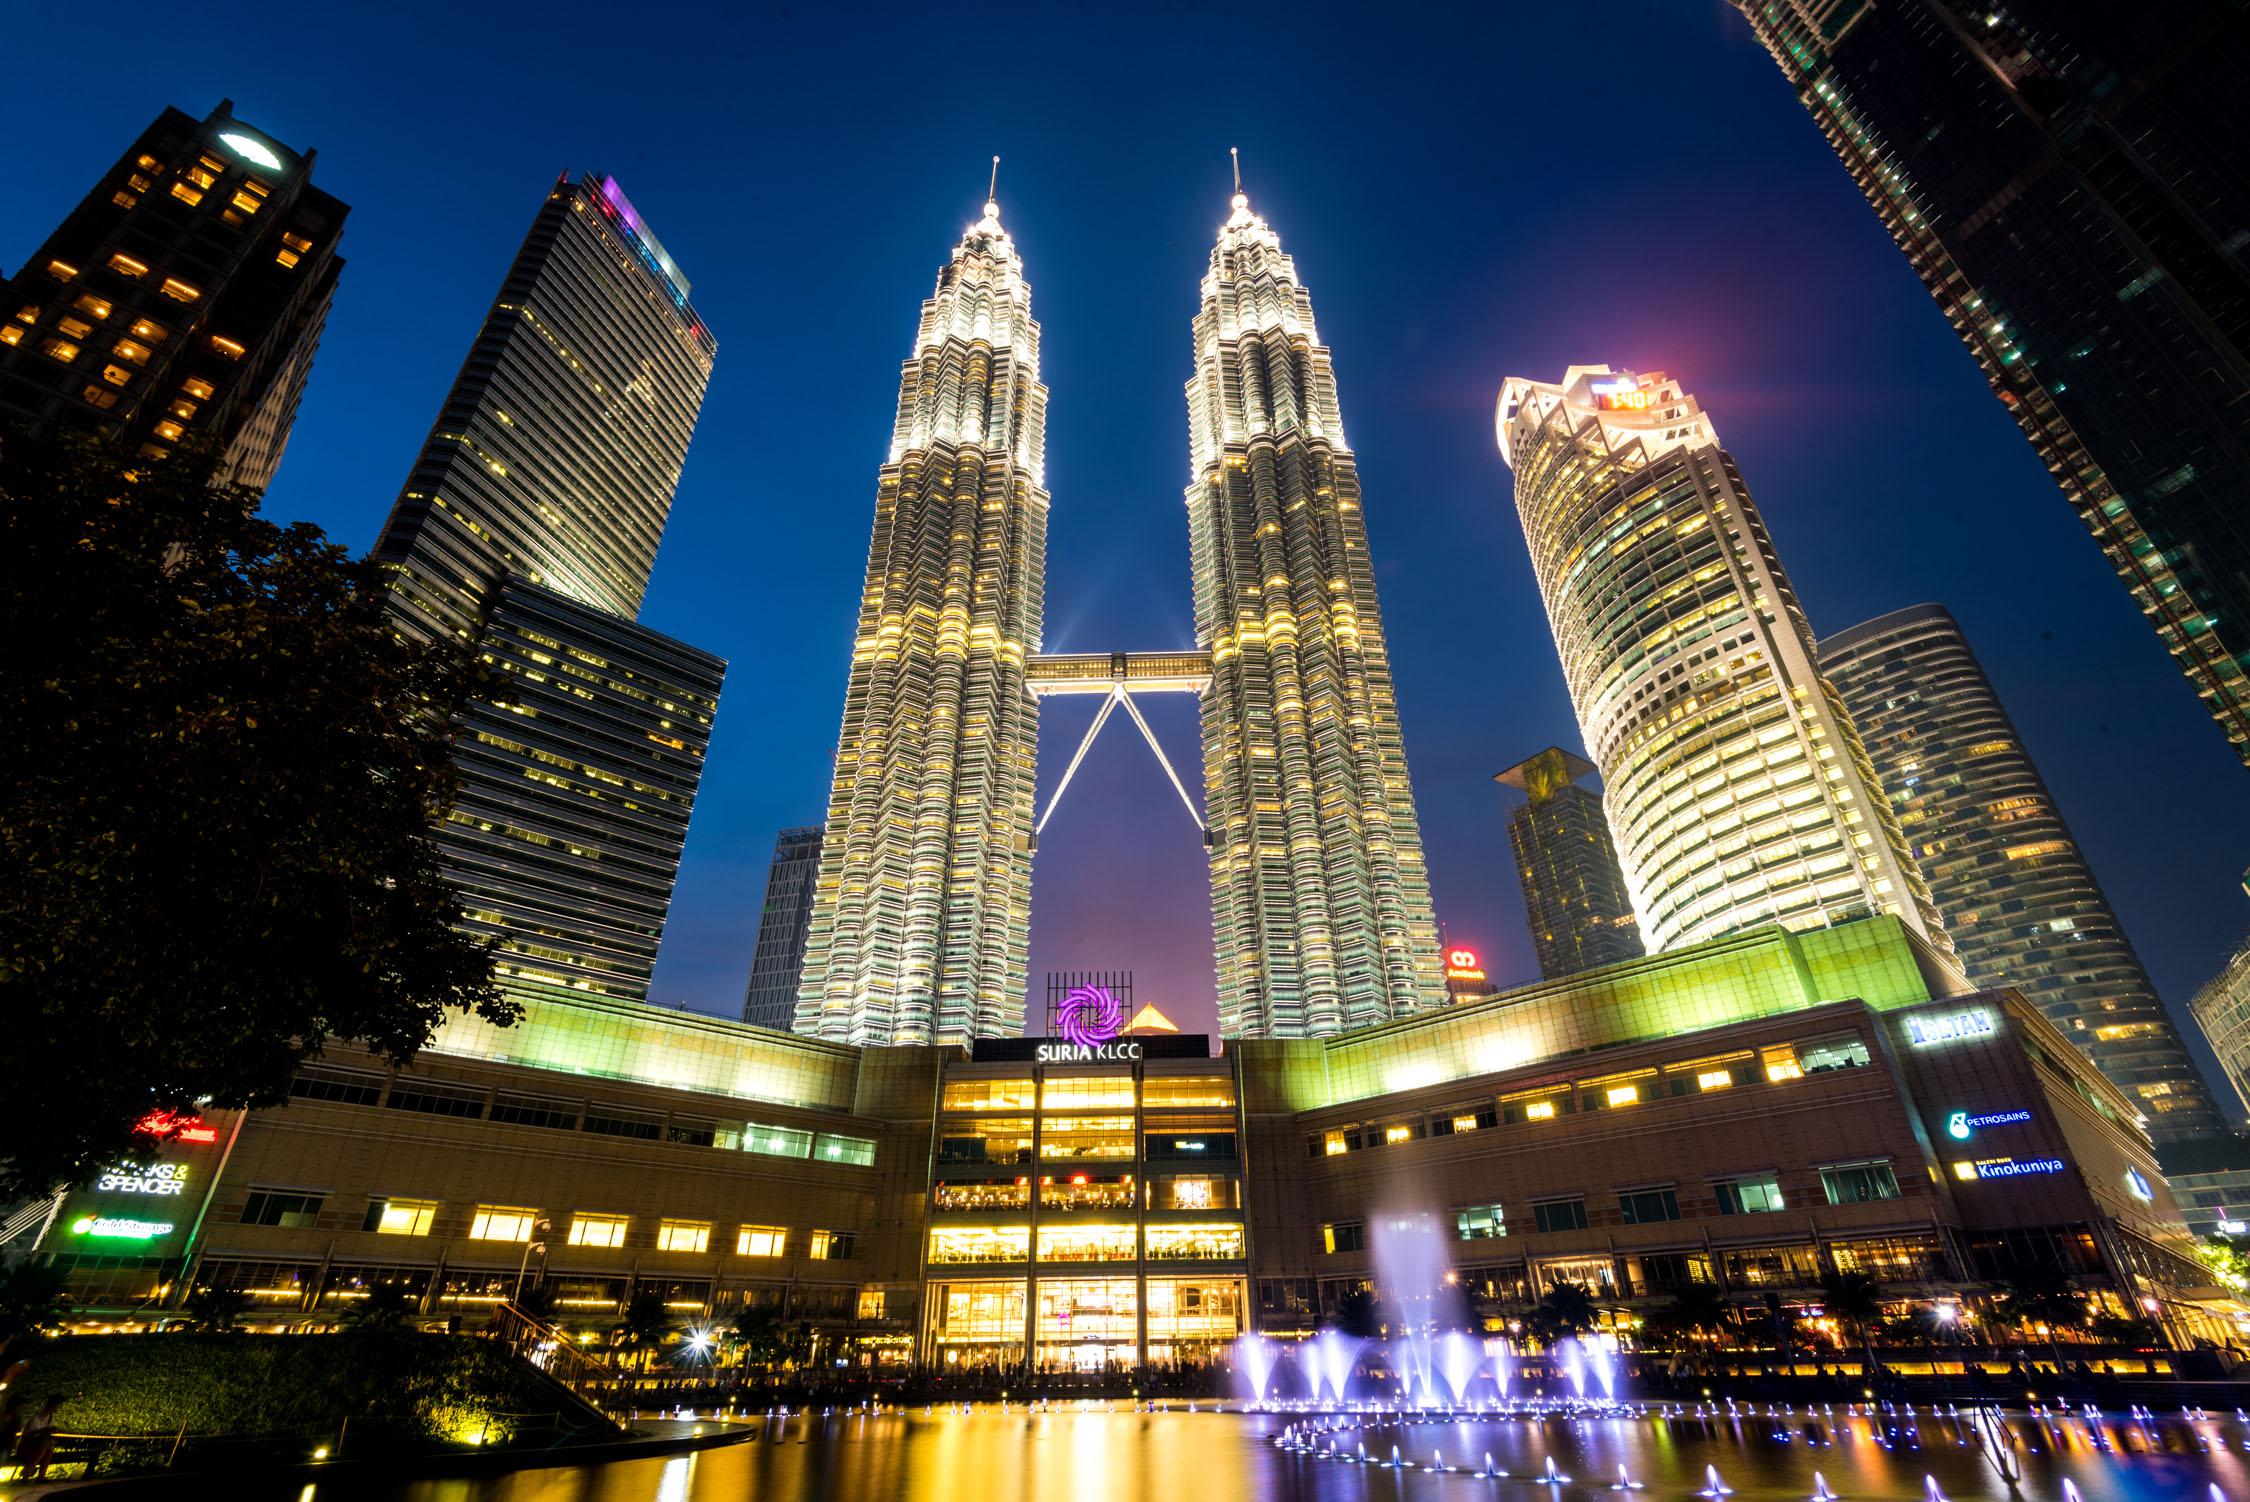 Kuala_Lumpur-271-20170503.jpg